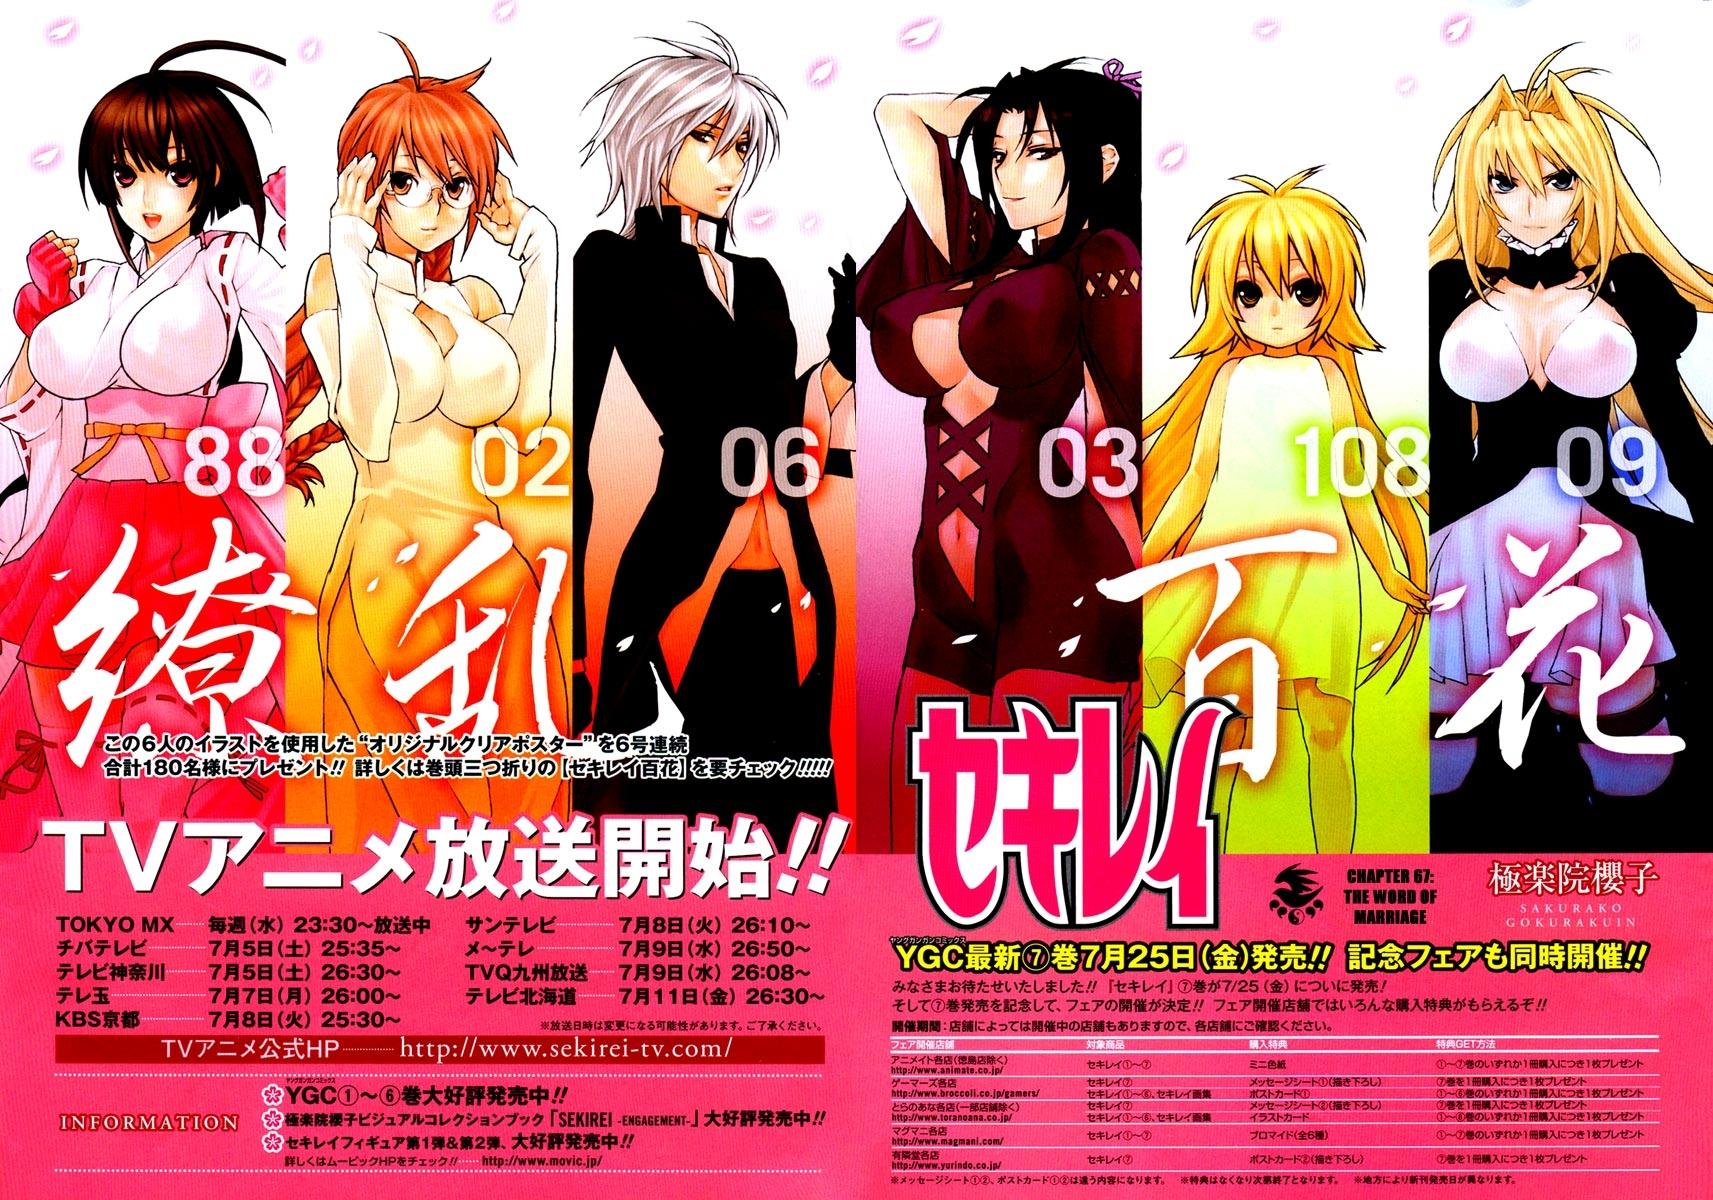 Sekirei Chapter 067 Colored 01.jpg